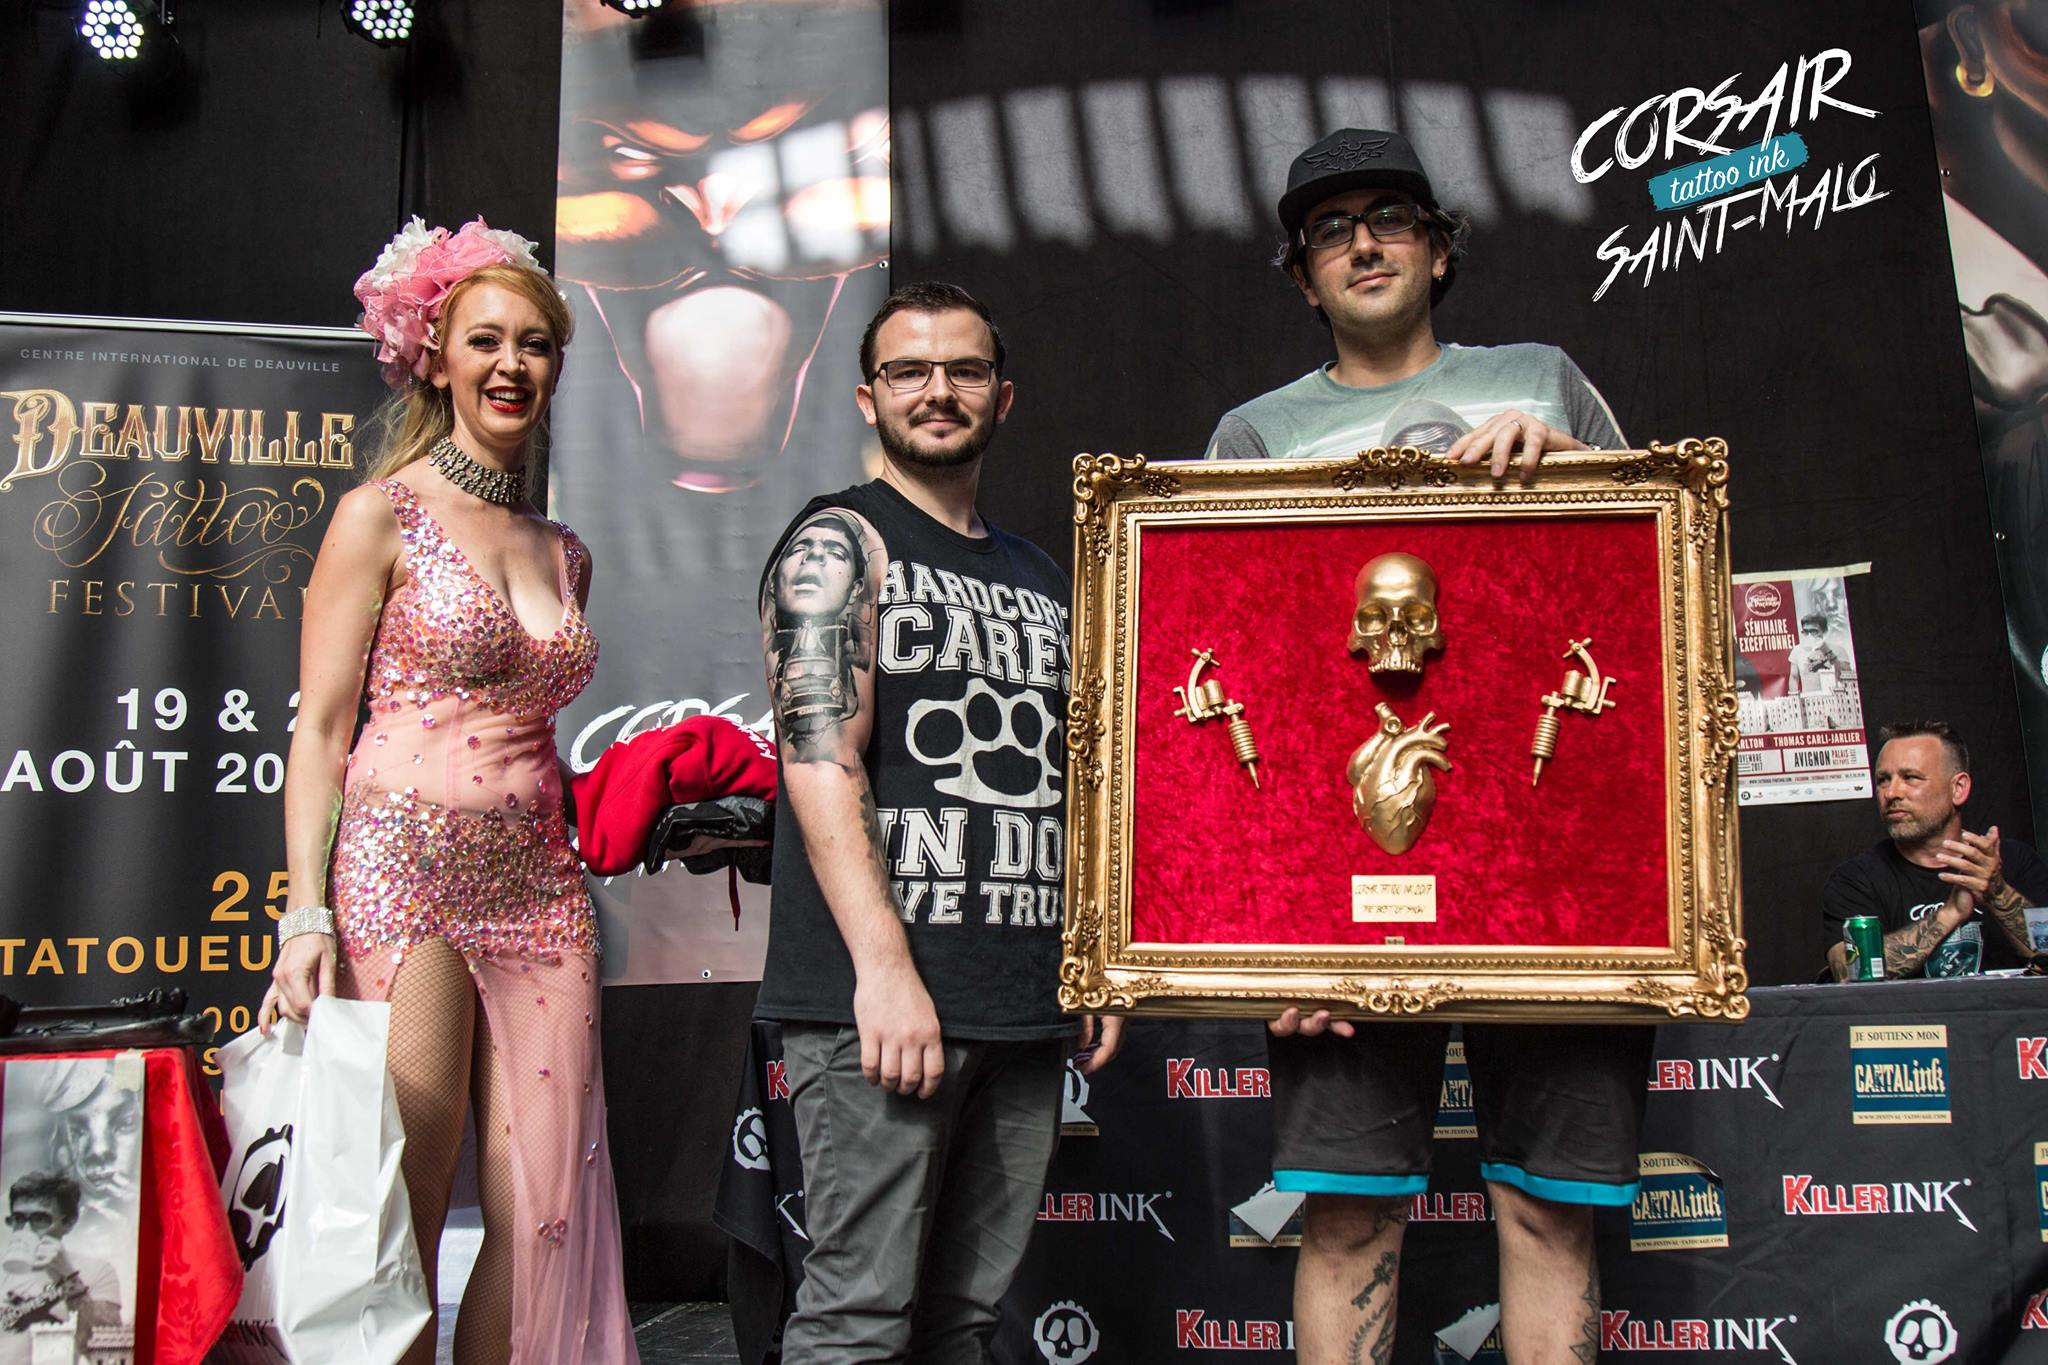 concours-tatouage-corsair-tattoo-ink-convention-tatouage-bretagne (8)